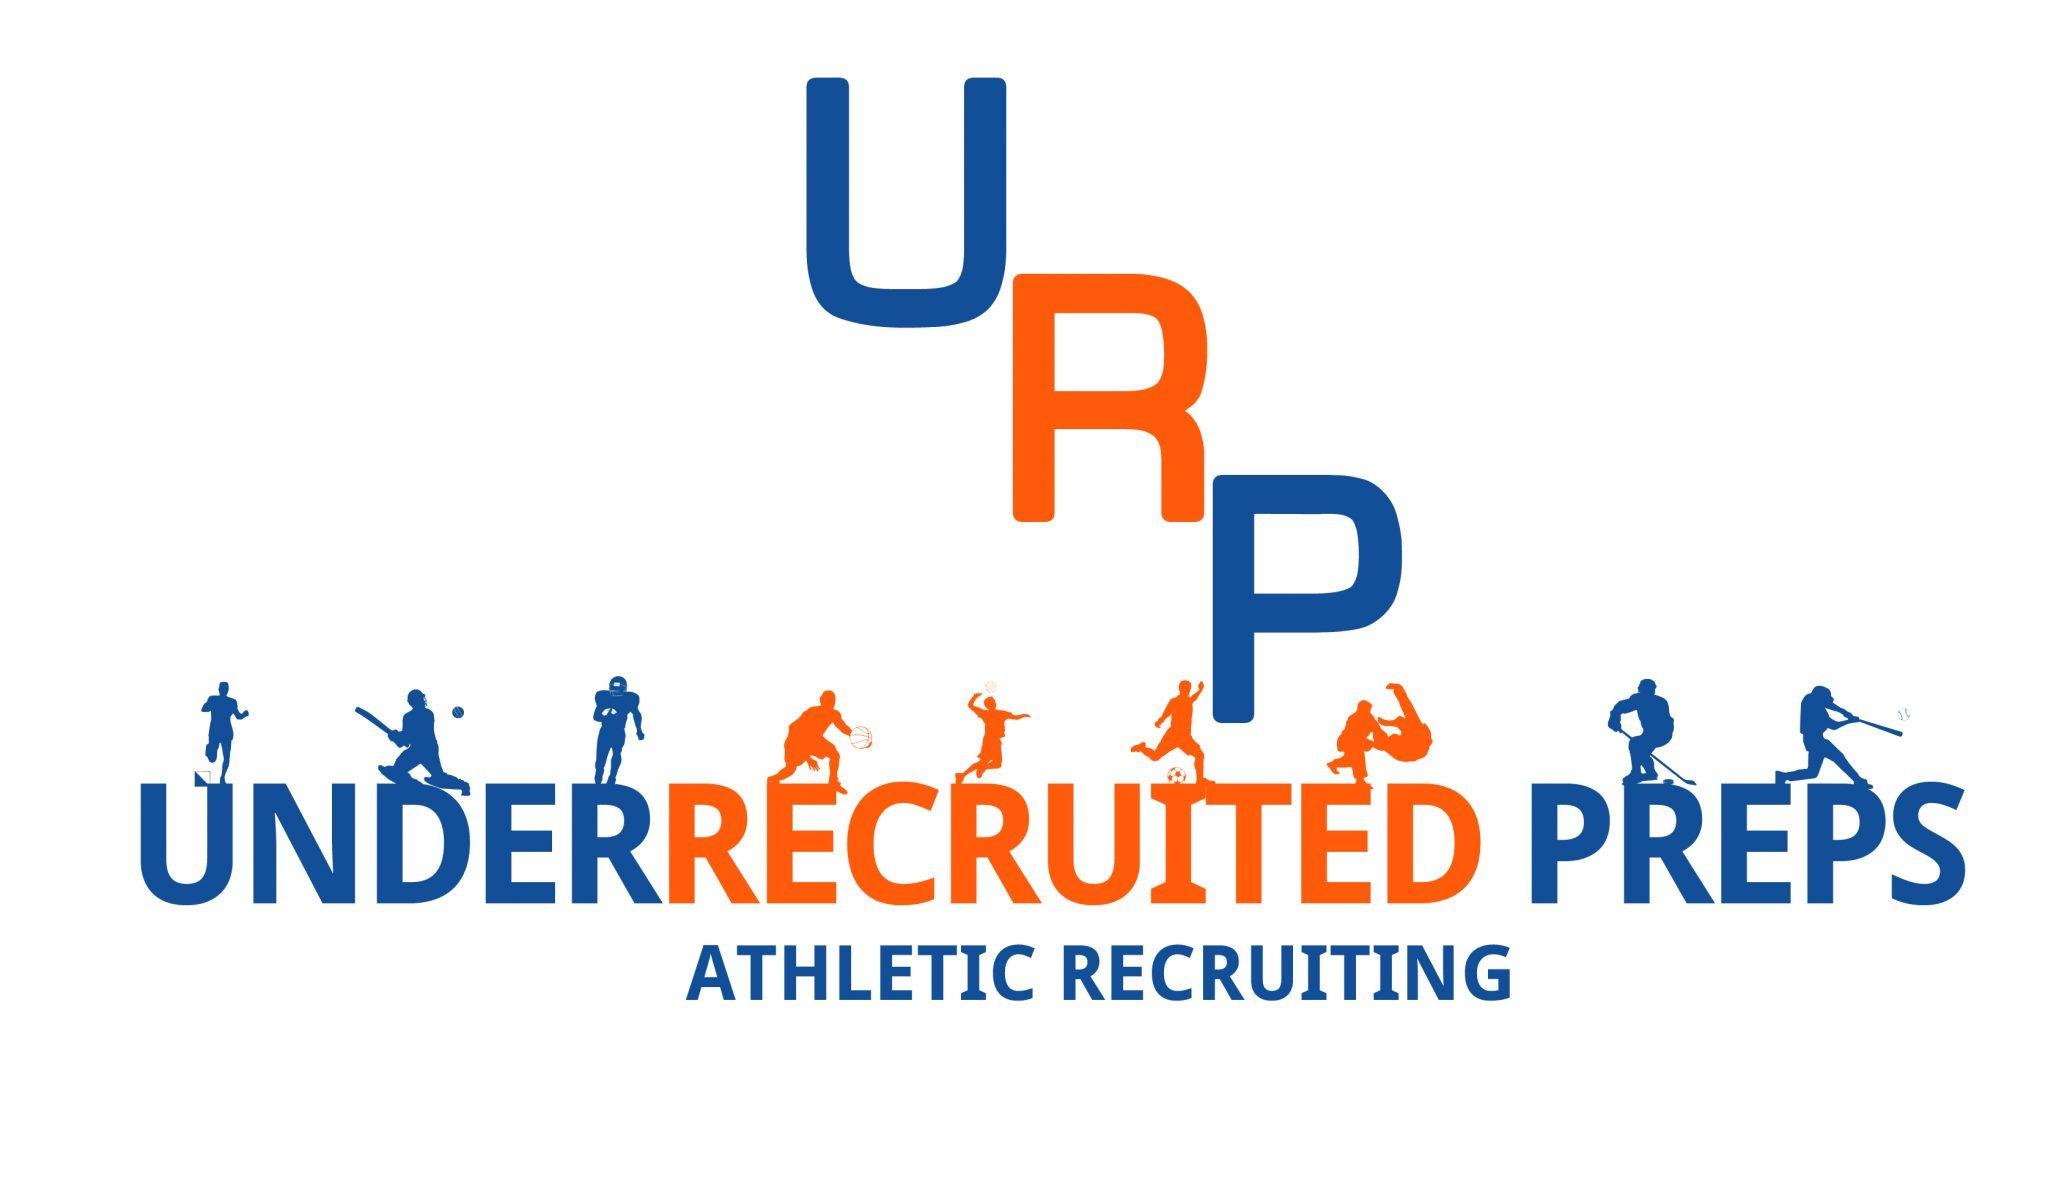 UnderRecruited Preps